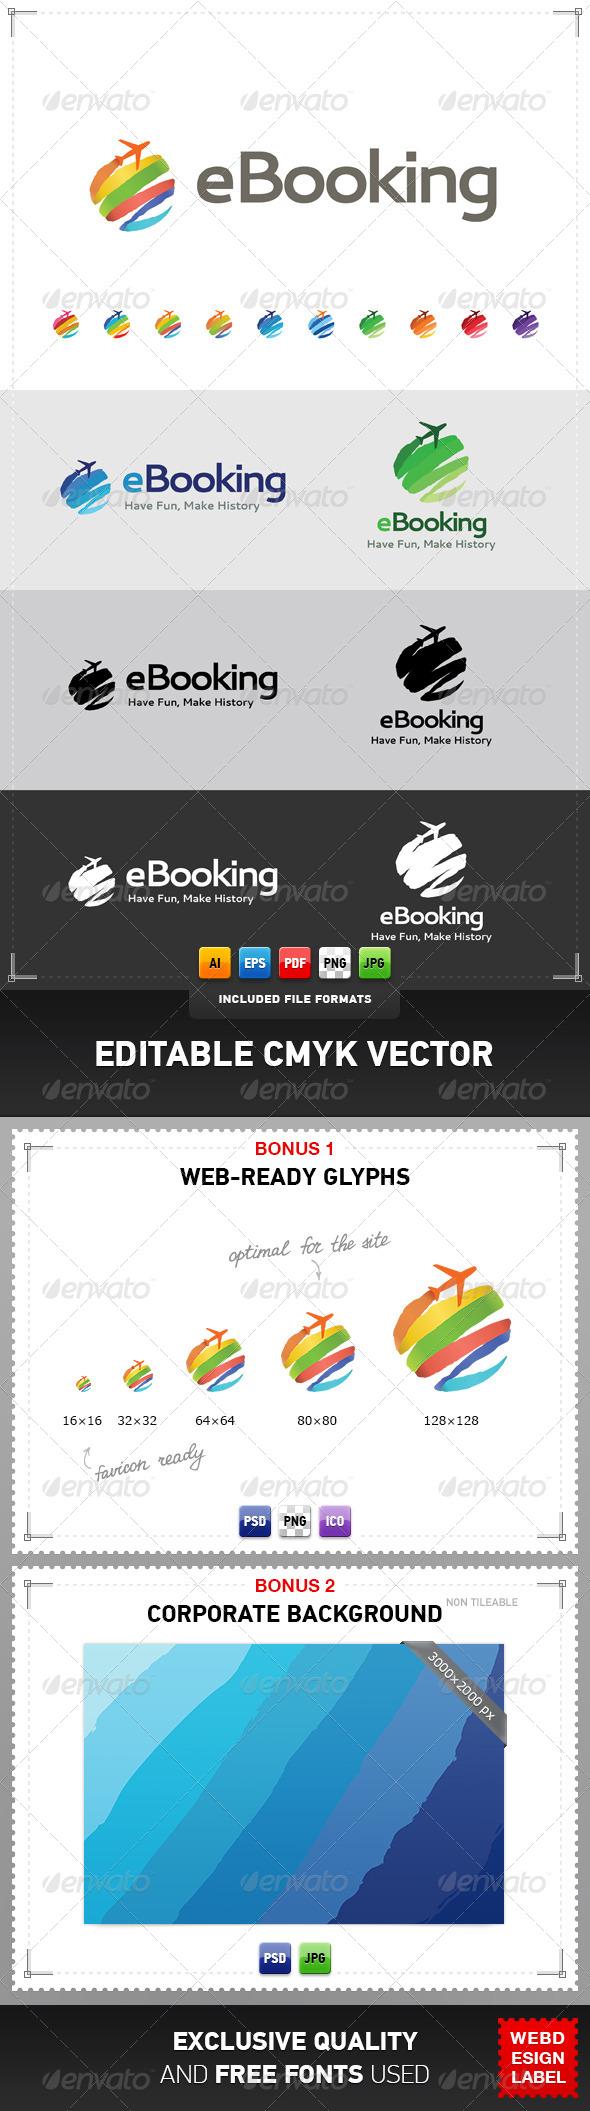 eBooking Logo - Objects Logo Templates